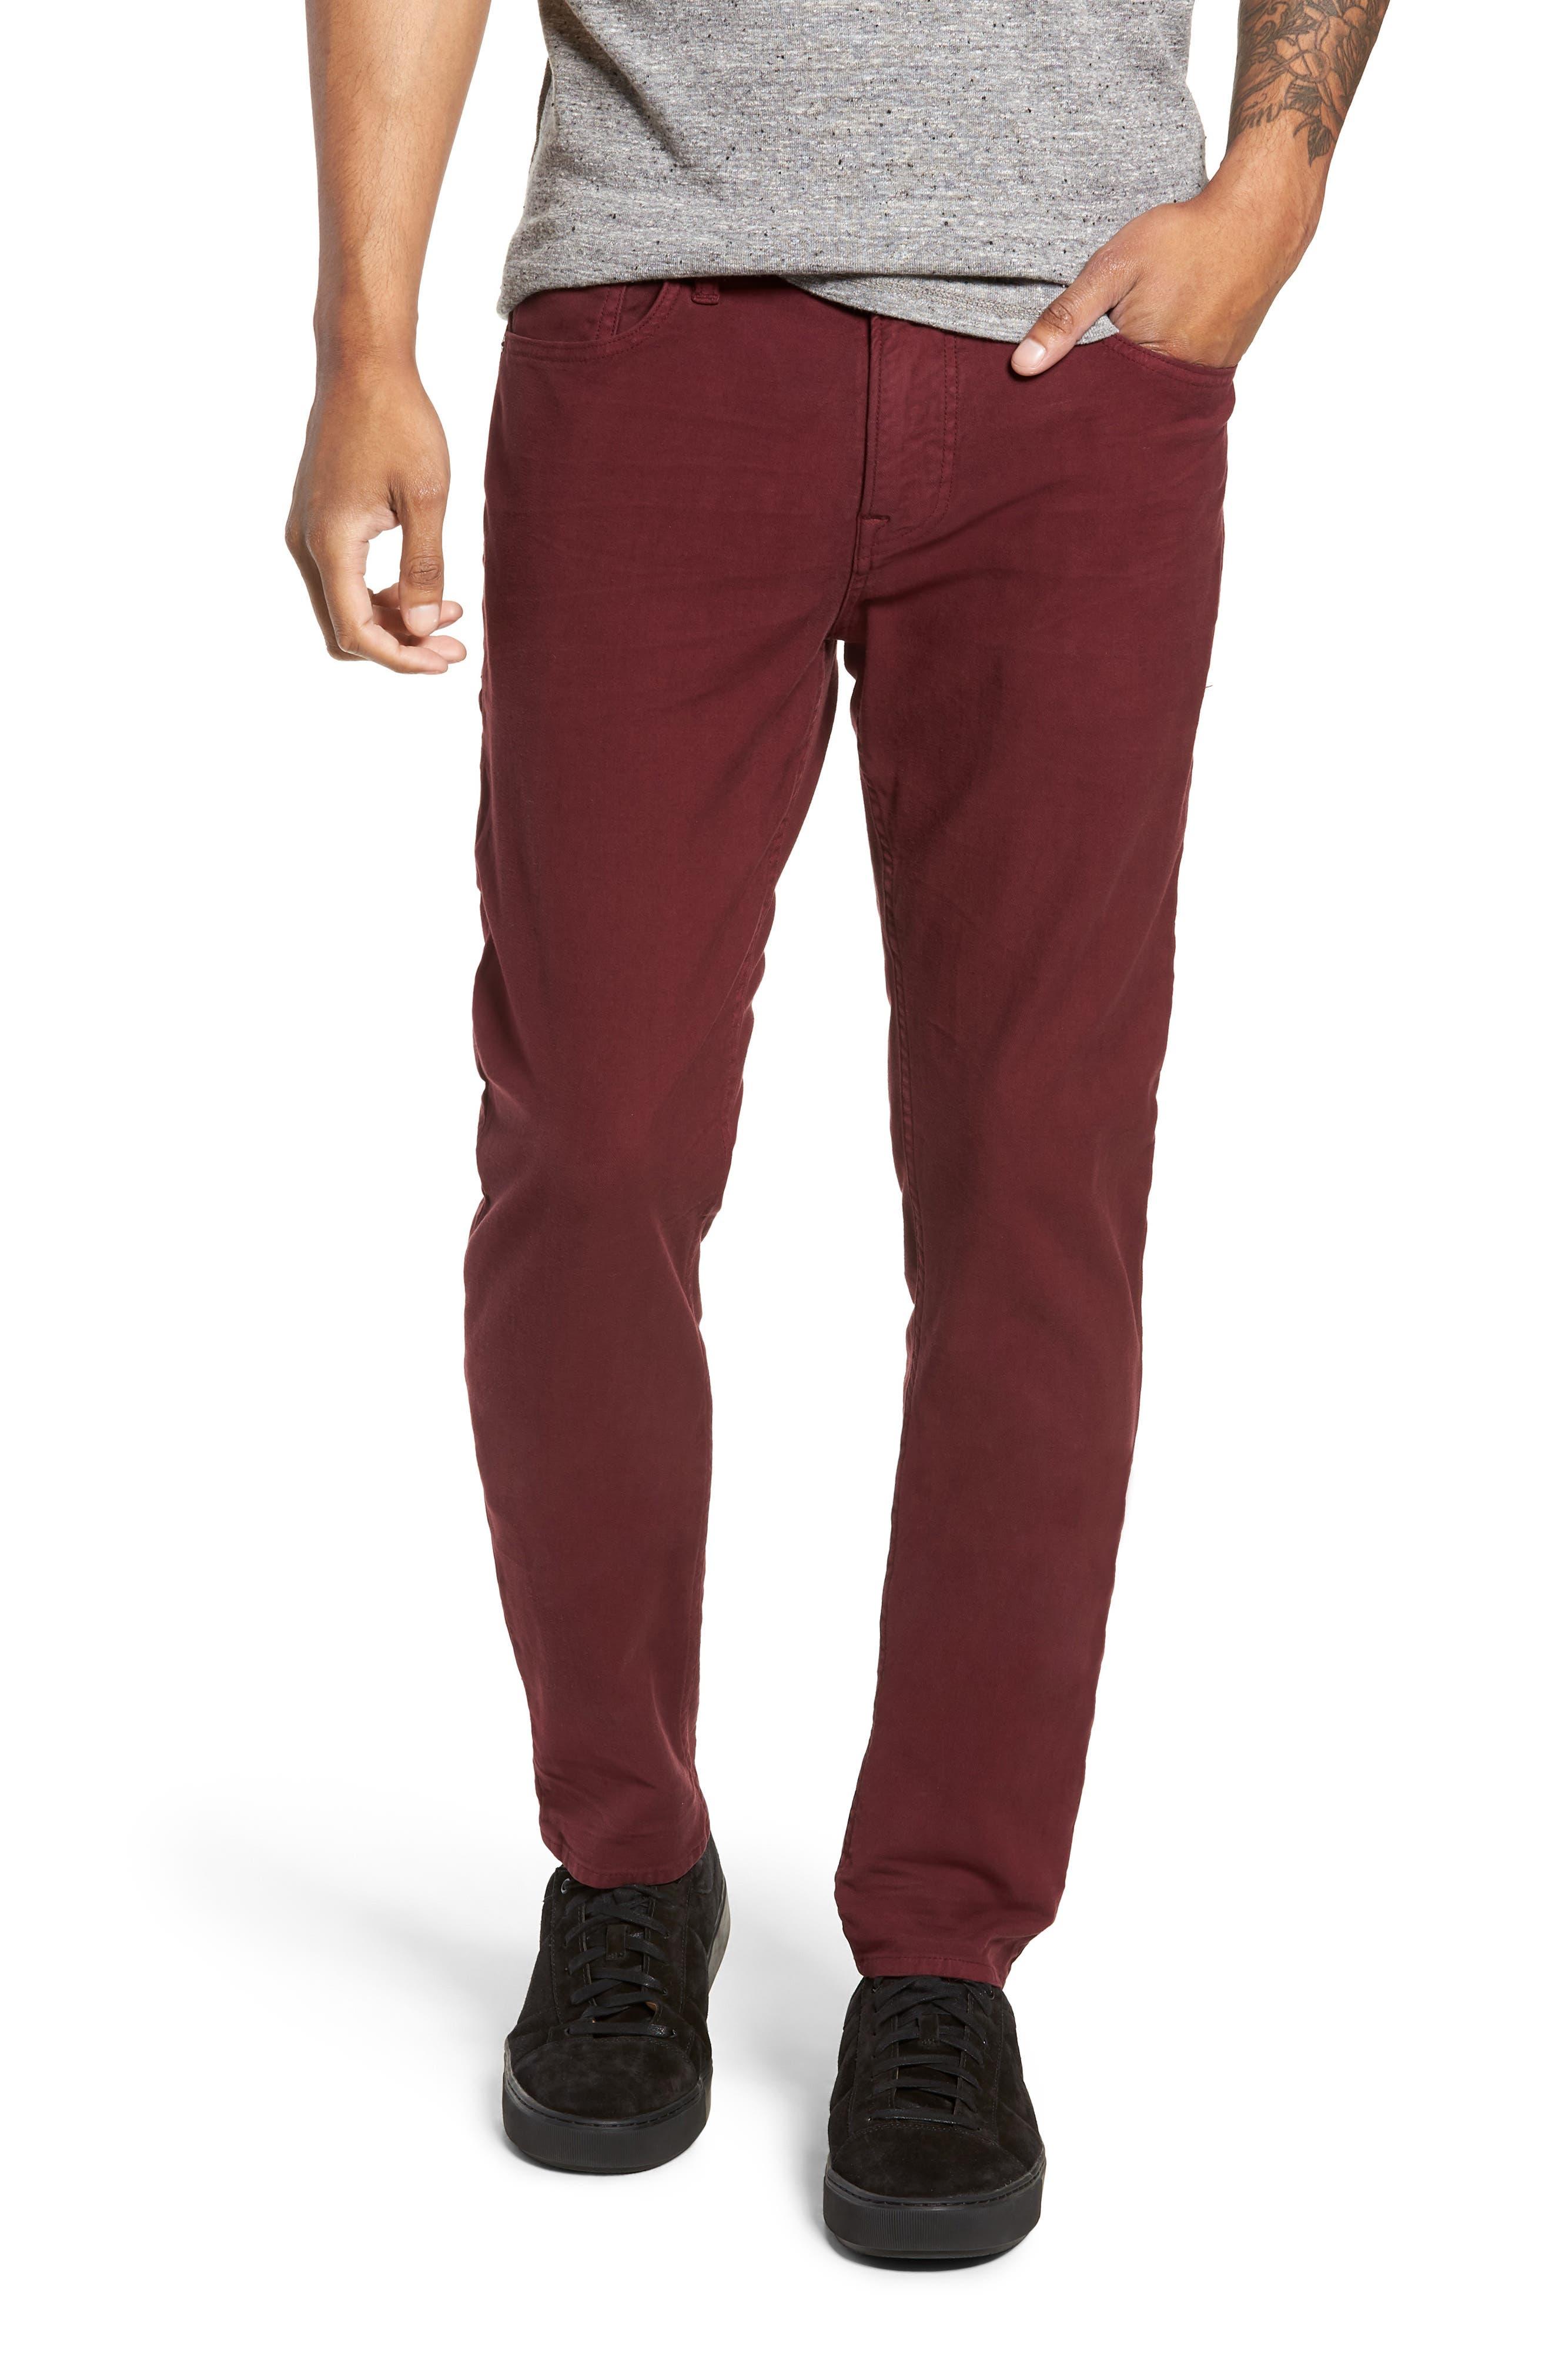 Axl Skinny Fit Twill Jeans,                         Main,                         color, OXBLOOD